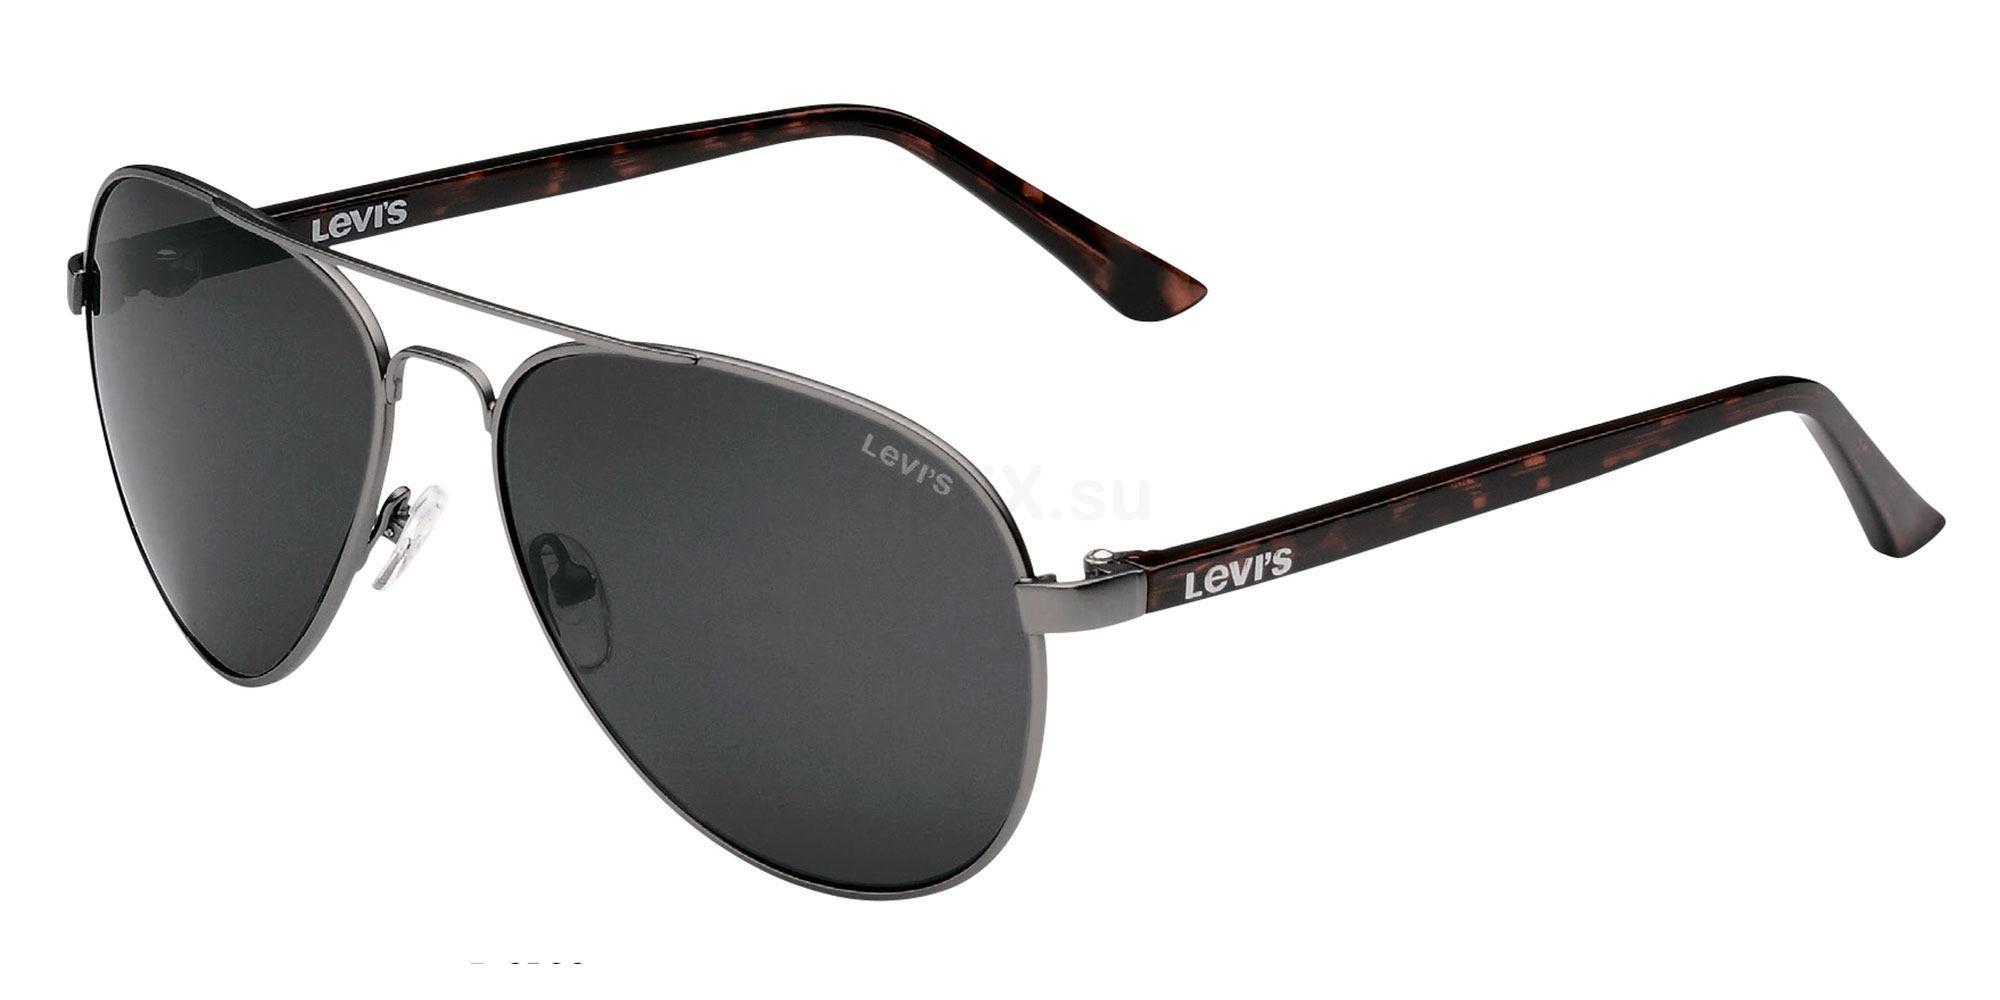 LO22371/01 LO22371 Sunglasses, Levi's Eyewear